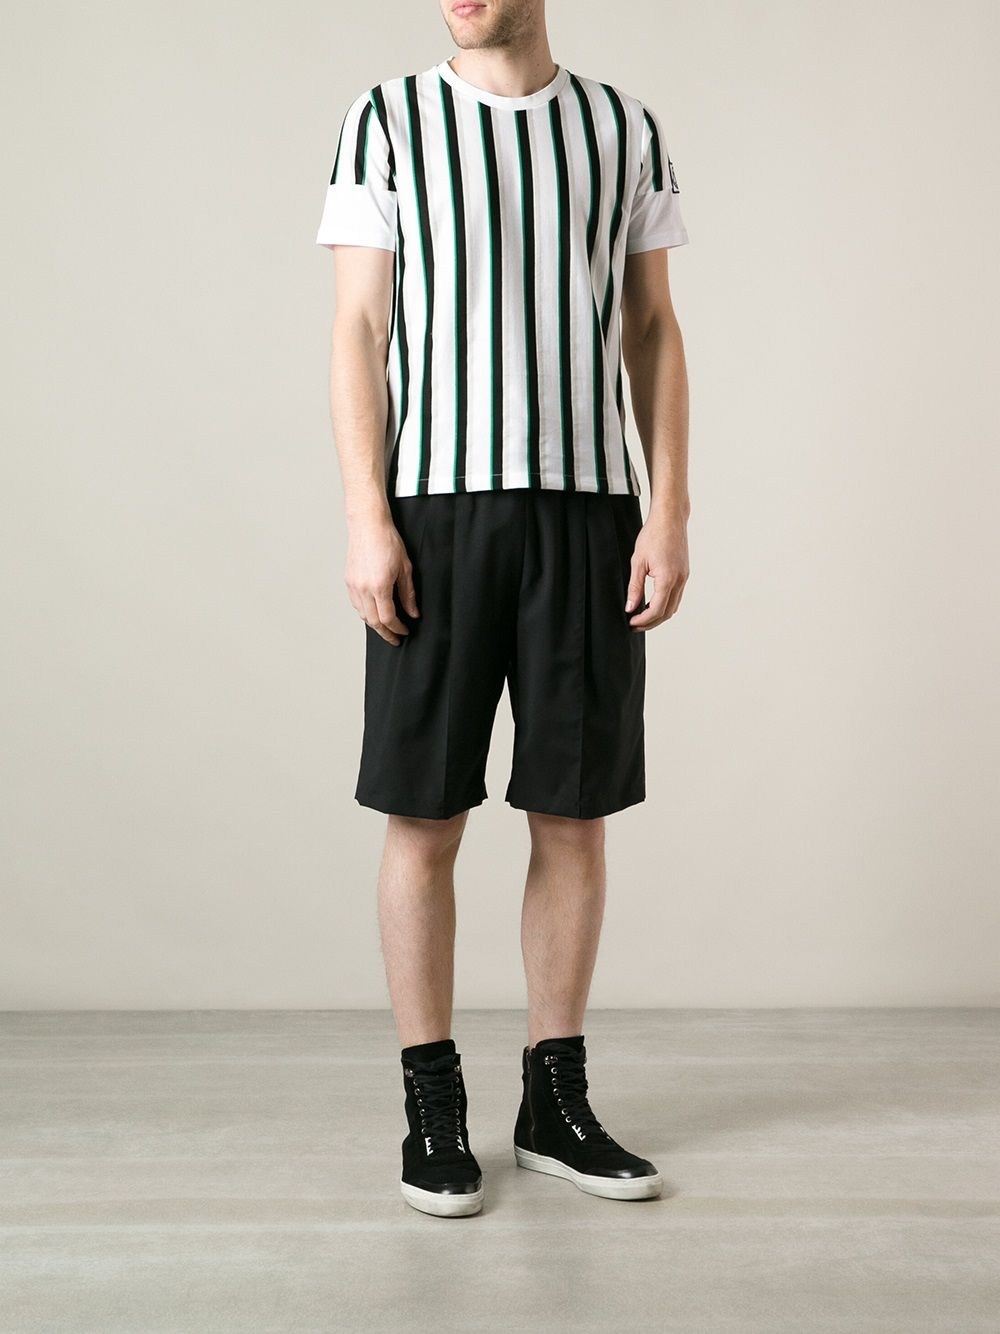 Moncler Gamme Bleu Striped T-shirt - Parisi - Farfetch.com